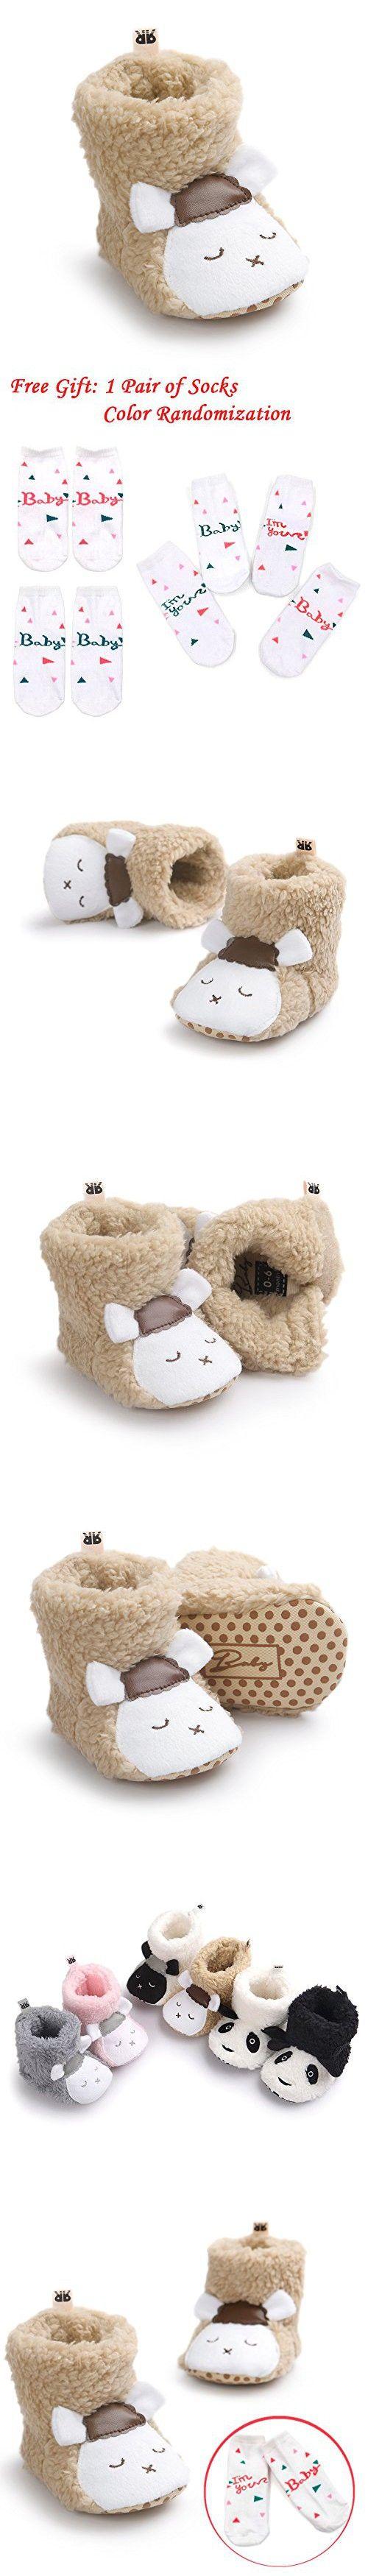 LIVEBOX Baby Boy and Girls' Premium Soft Sole Cartoon Animal Anti-Slip Mid Calf Warm Winter Infant Prewalker Toddler Snow Boots With Free Gift Socks (M: 6~12 months, Brown Sheep)